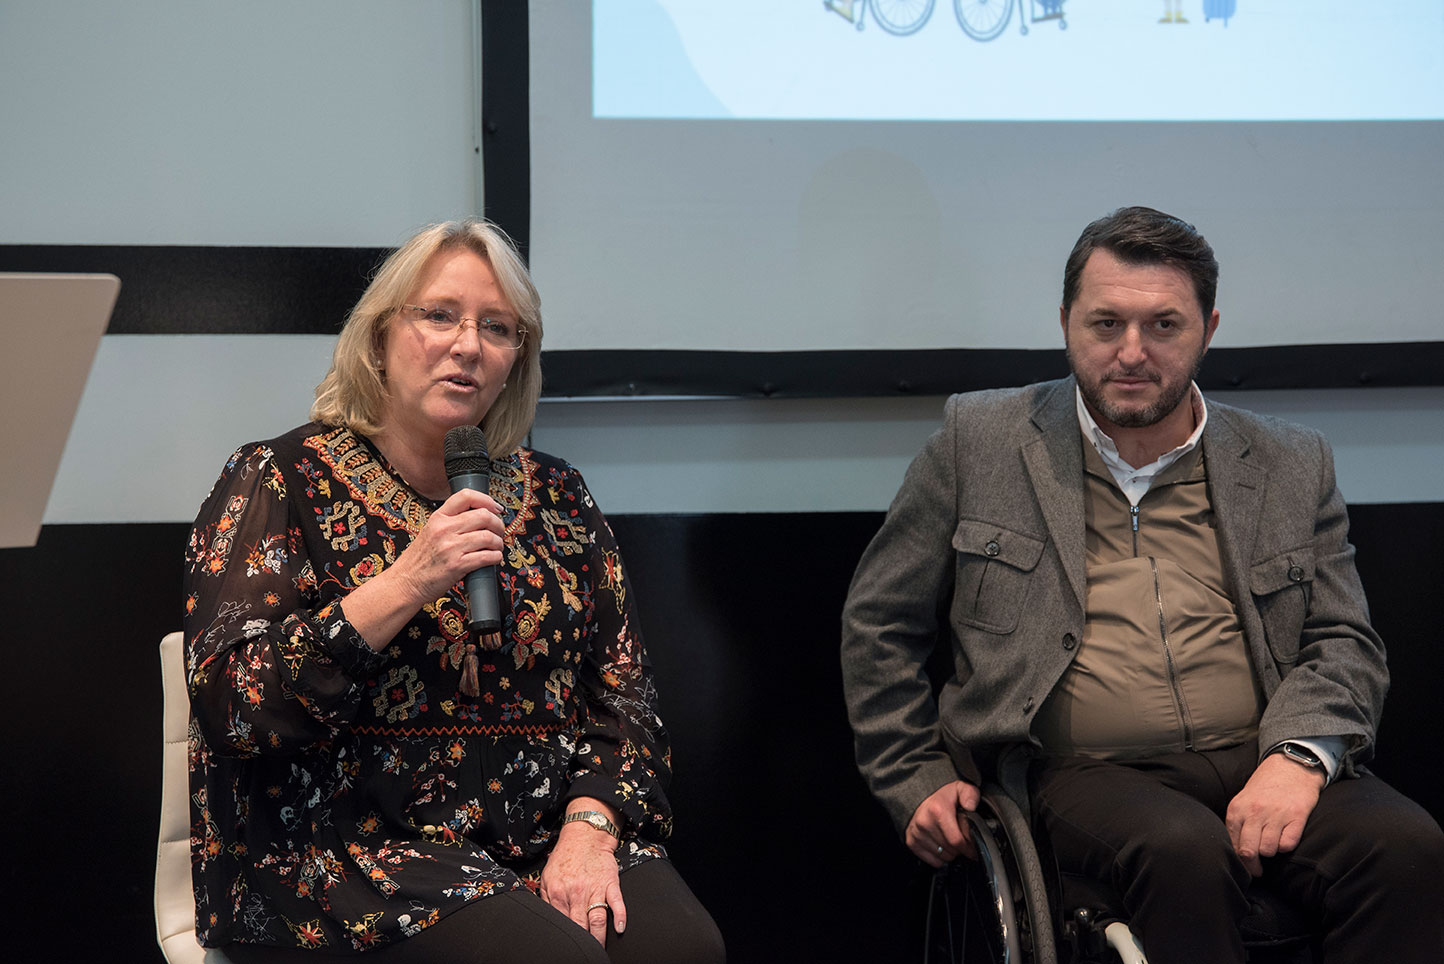 Ana-Garcia-Francisco-Sardon-Presentation-Congress-Madrid-in-November